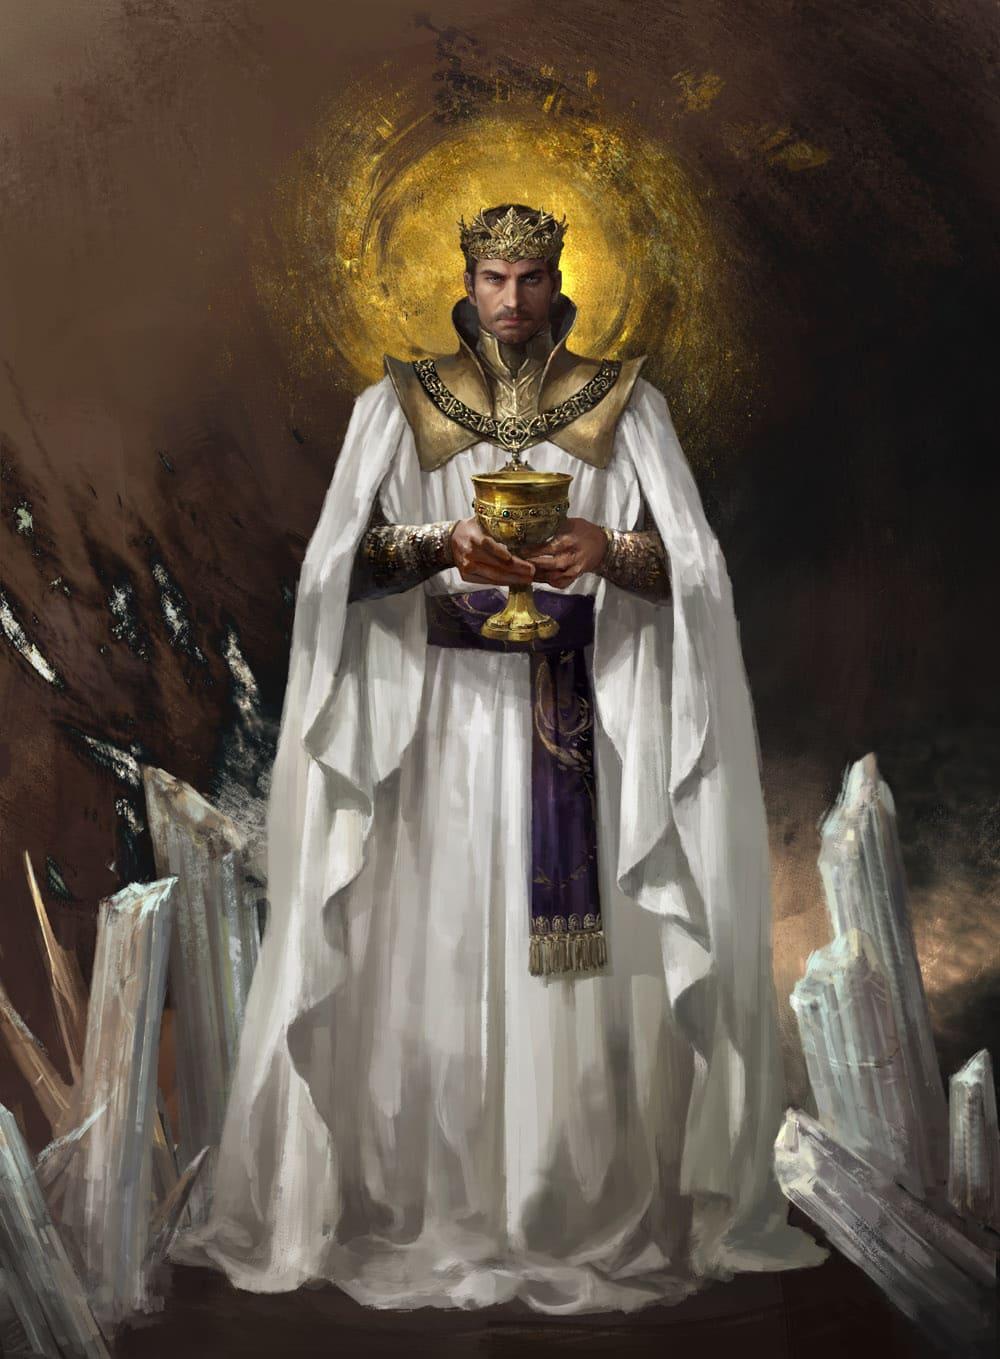 X:\2.行銷處\03. 各遊戲專案\29. Iron Throne:鐵之王座\04. 新聞稿相關\201811223_副官系統\New Protrait_ King.jpg